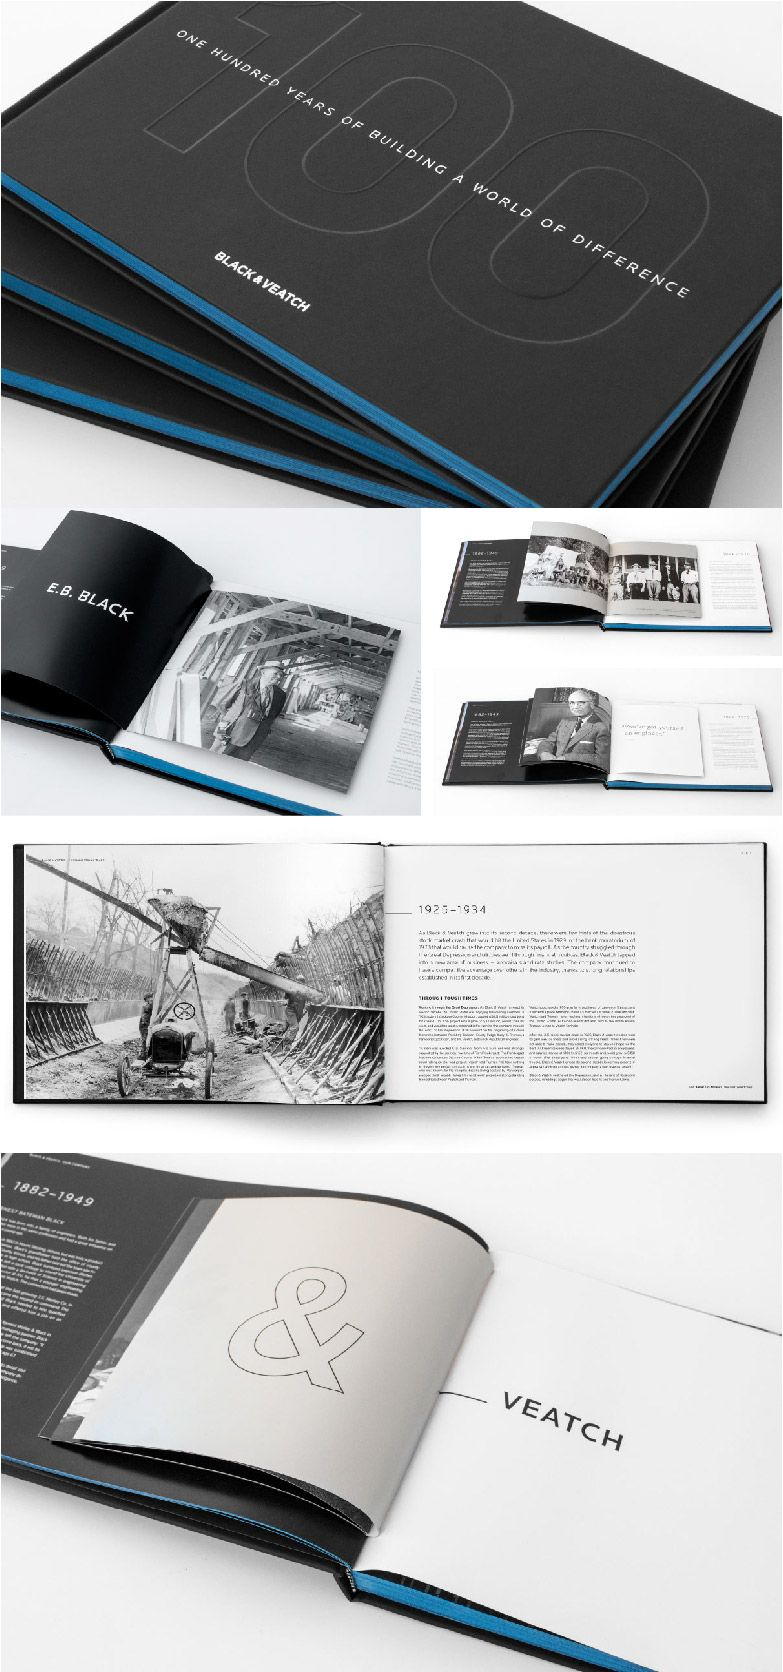 Black & Veatch Centennial Book | Copywriting, Design, Print, Art Direction | Design Ranch